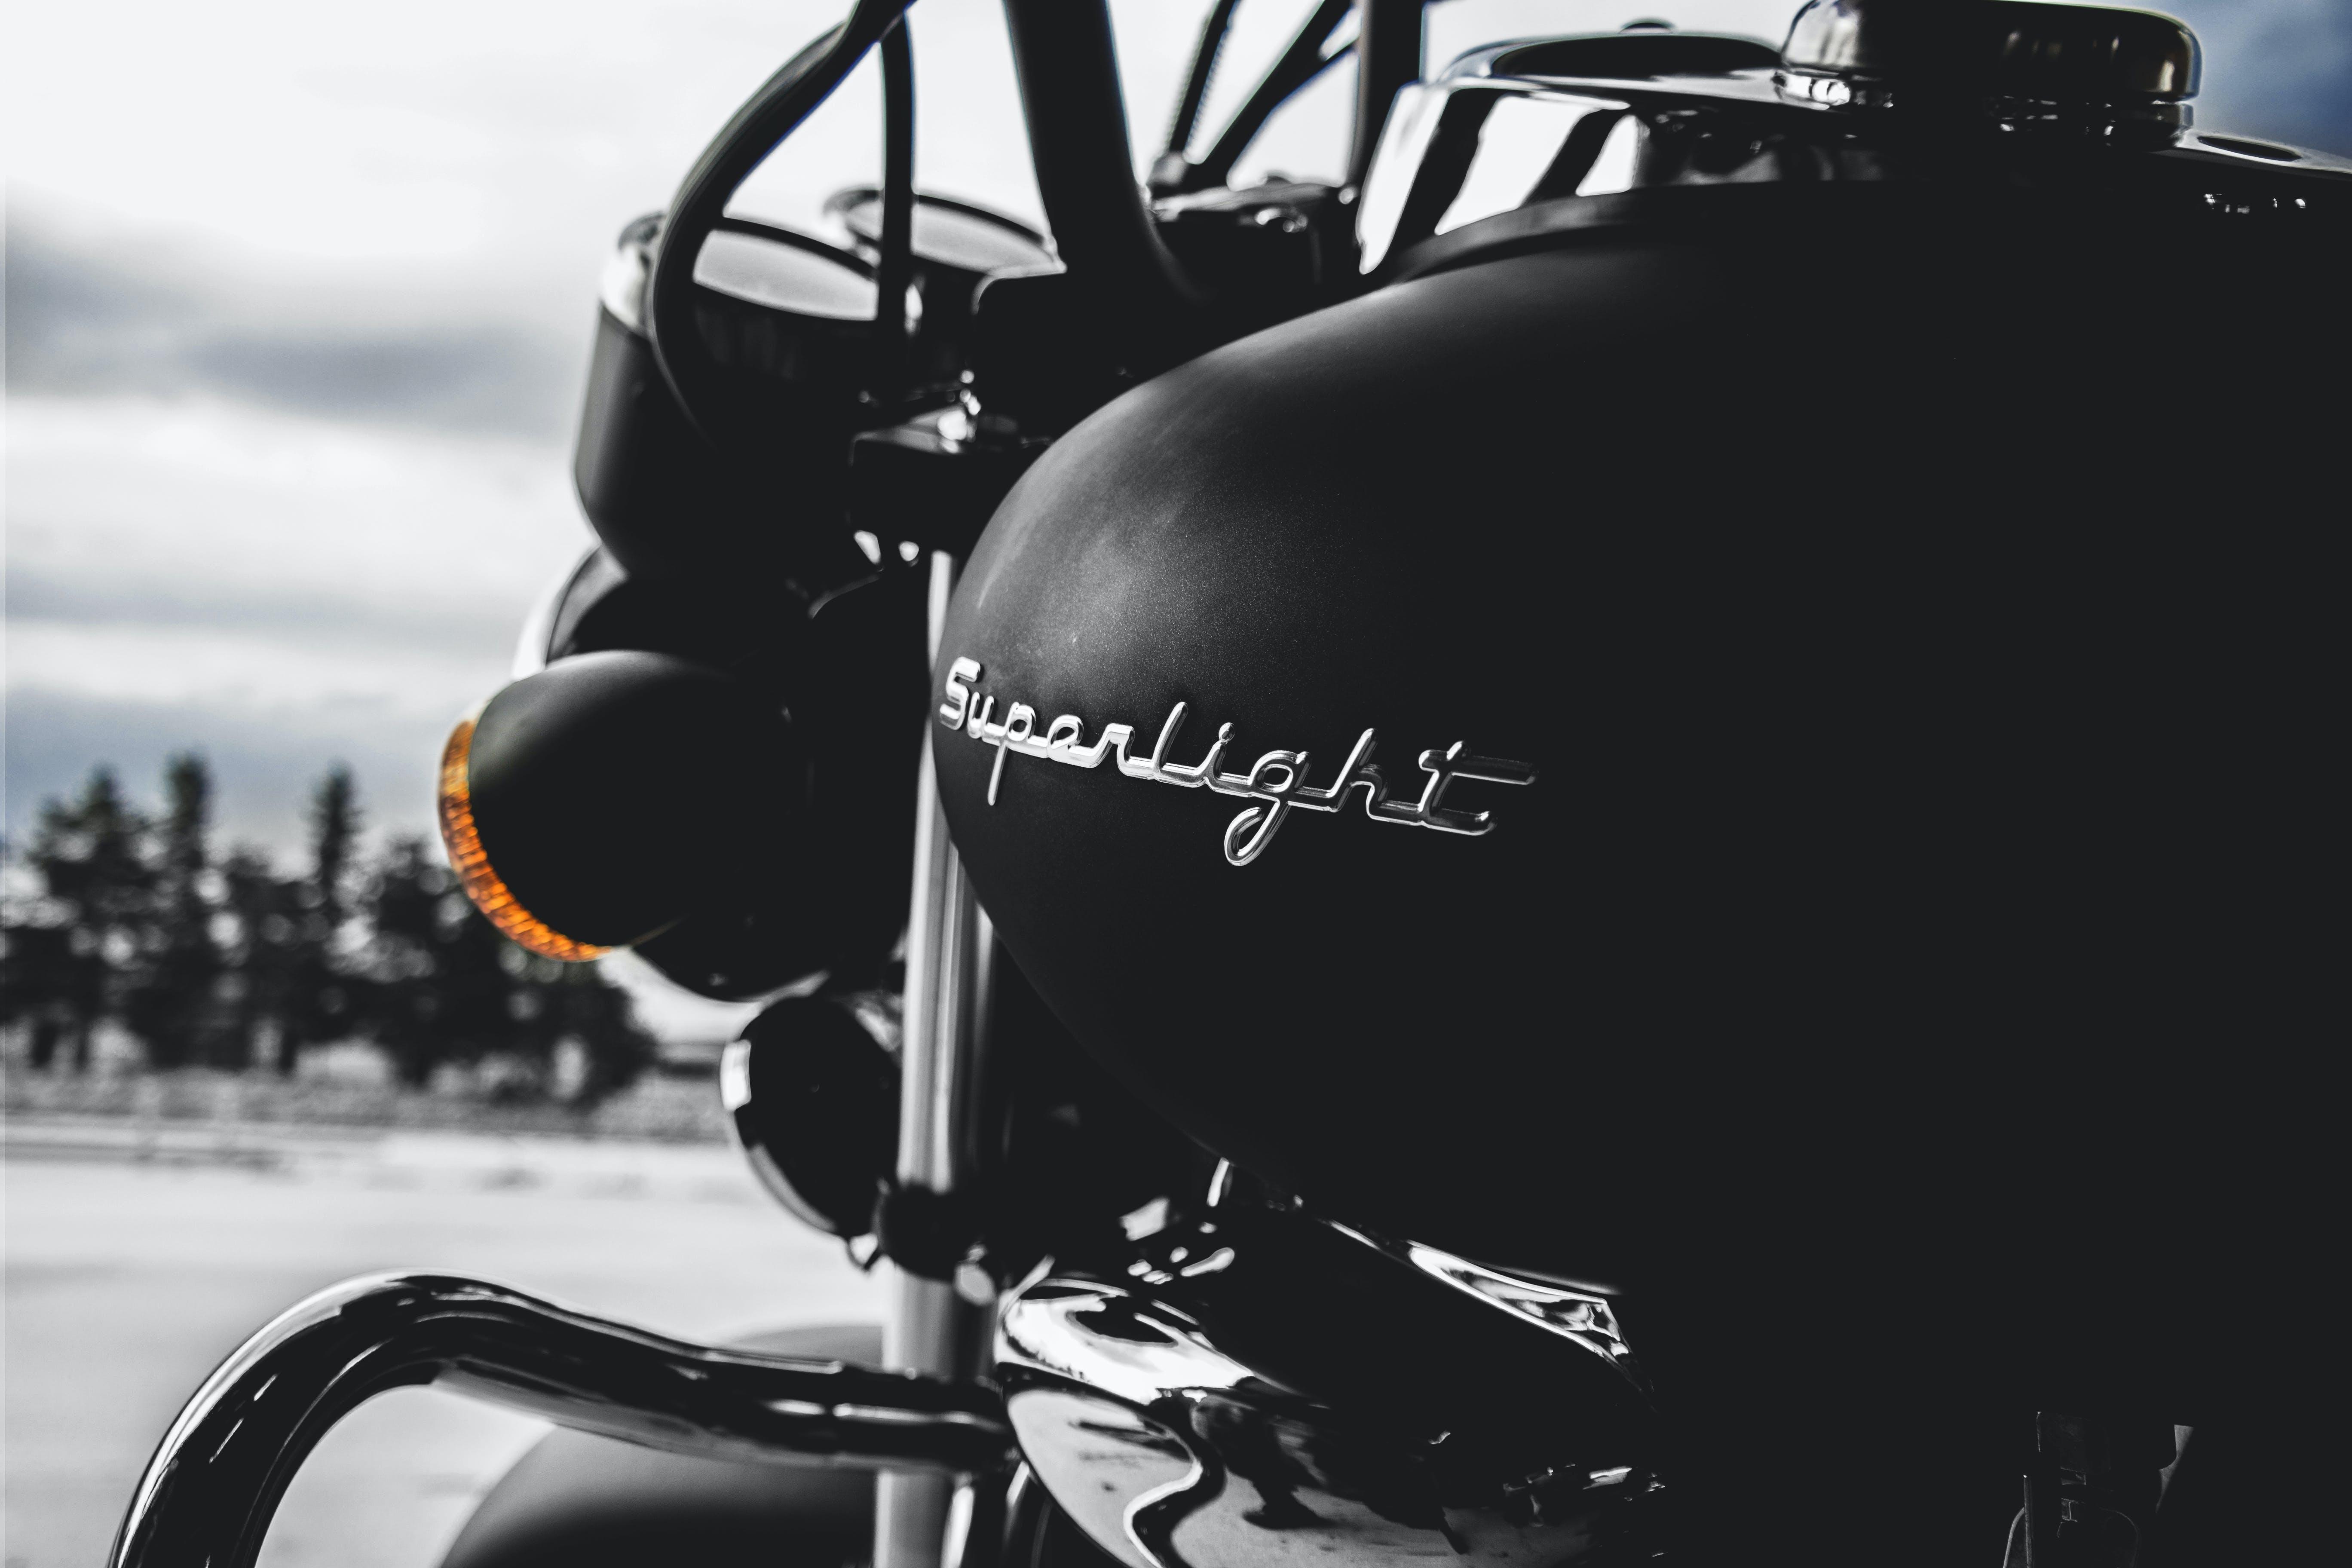 Superlight Motorcycle